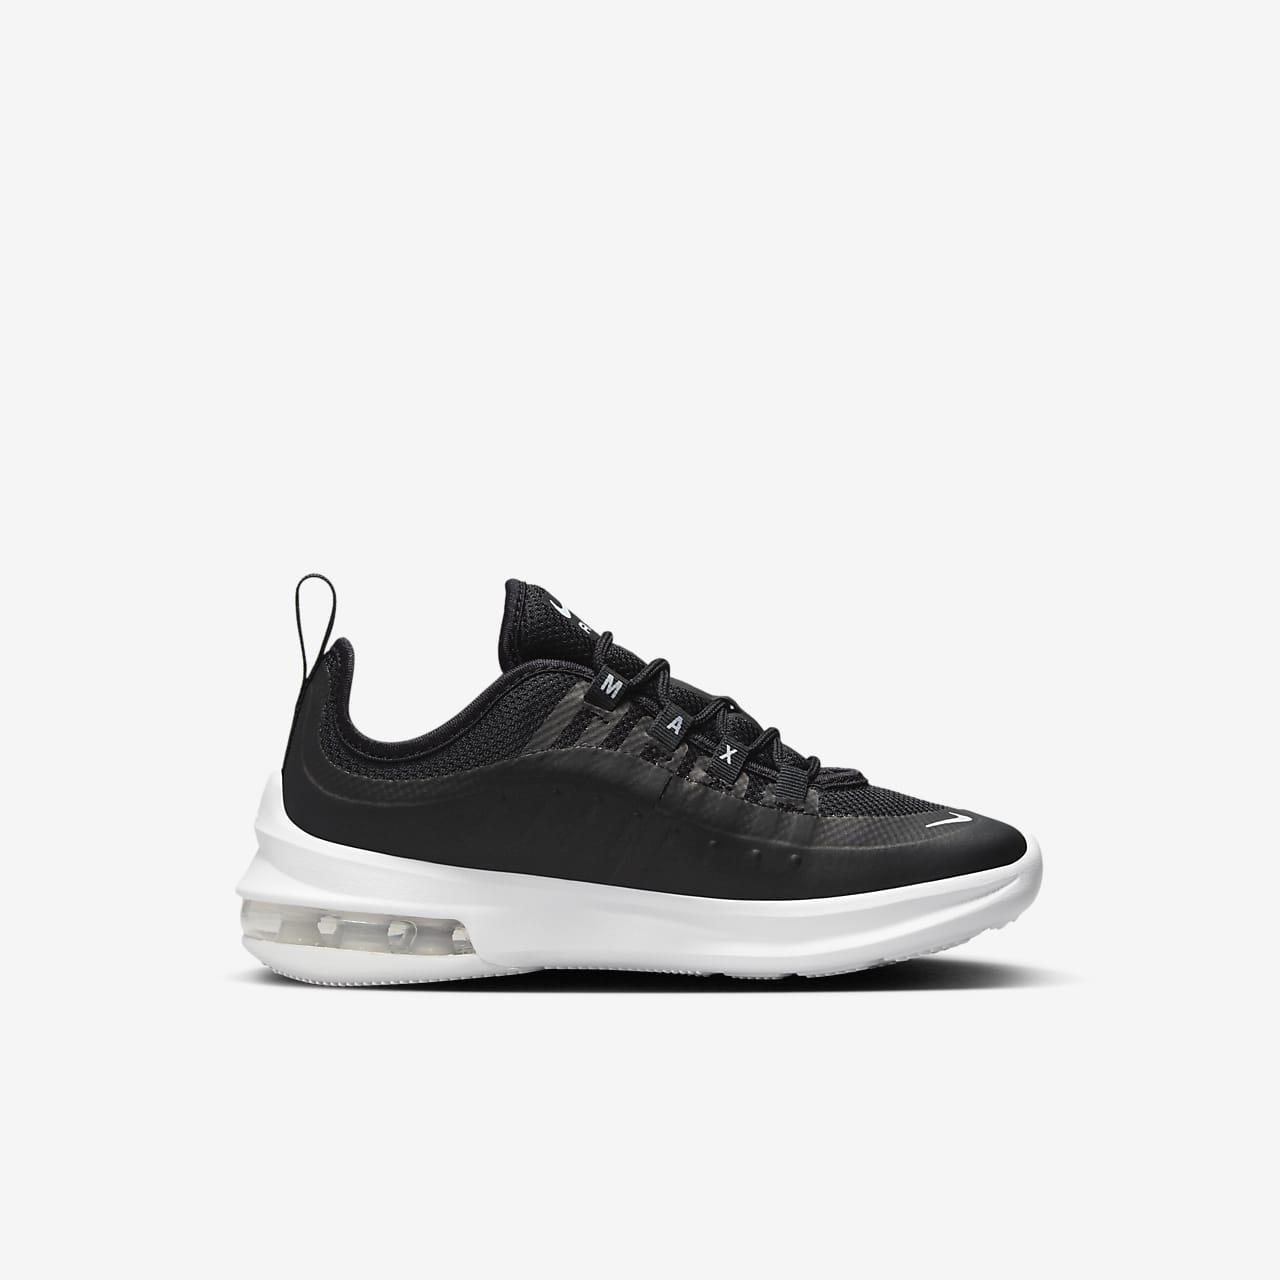 a43b51f04a Scarpa Nike Air Max Axis - Bambini. Nike.com IT